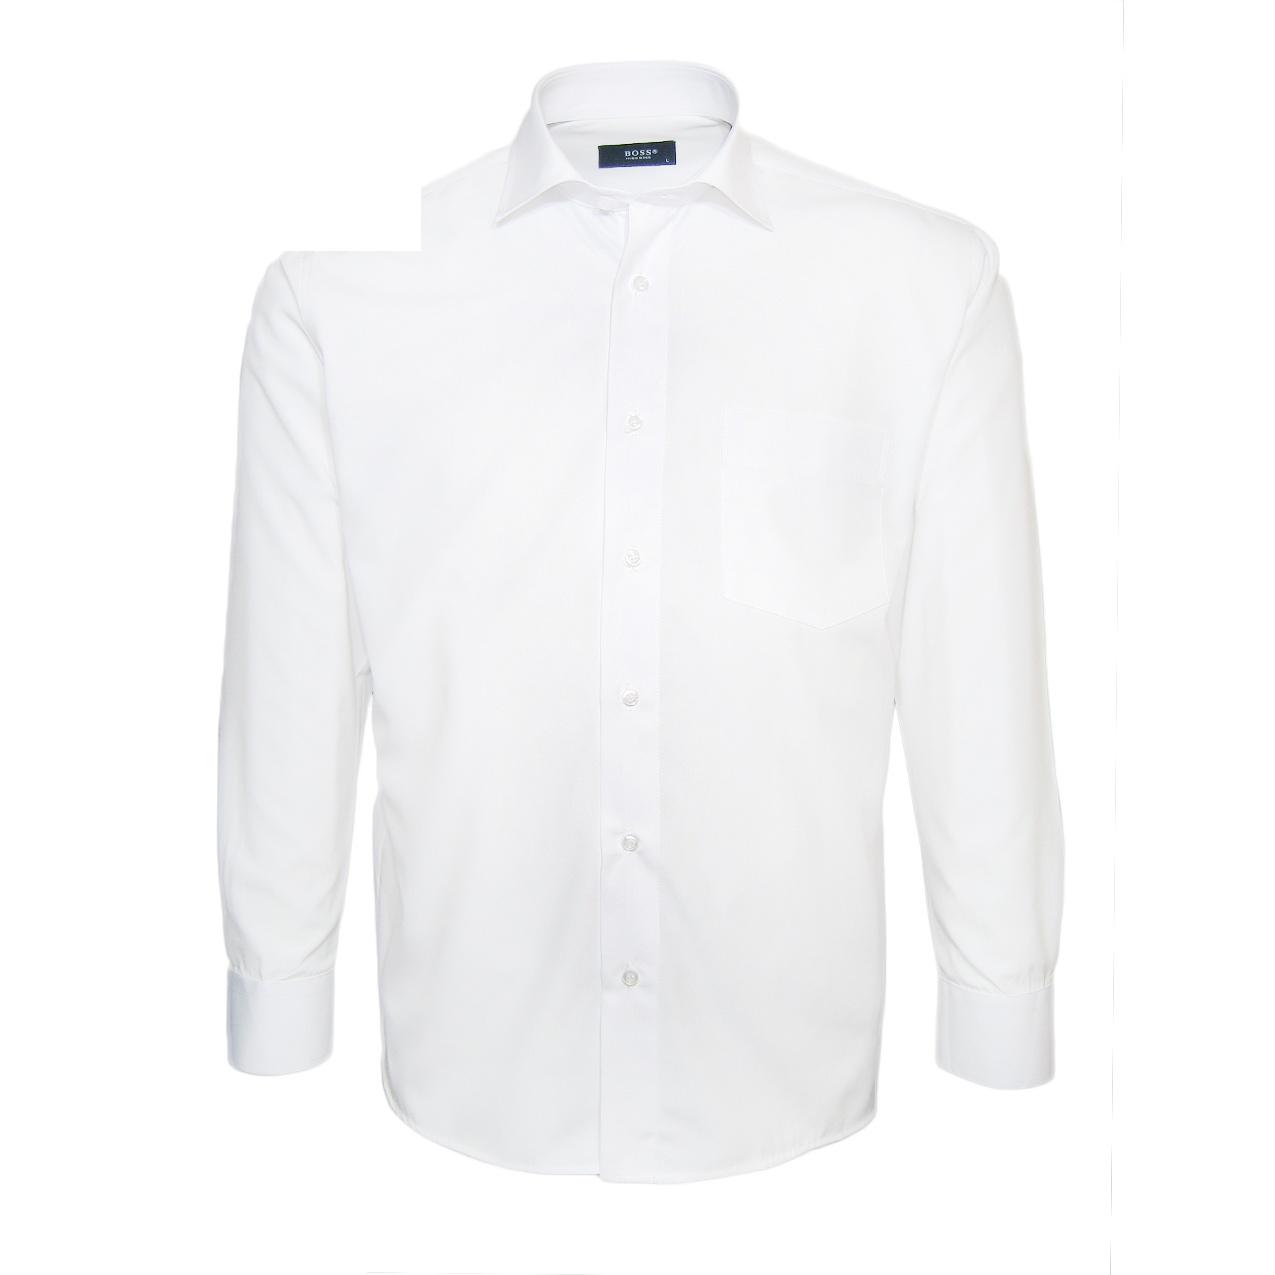 پیراهن مردانه کد 04